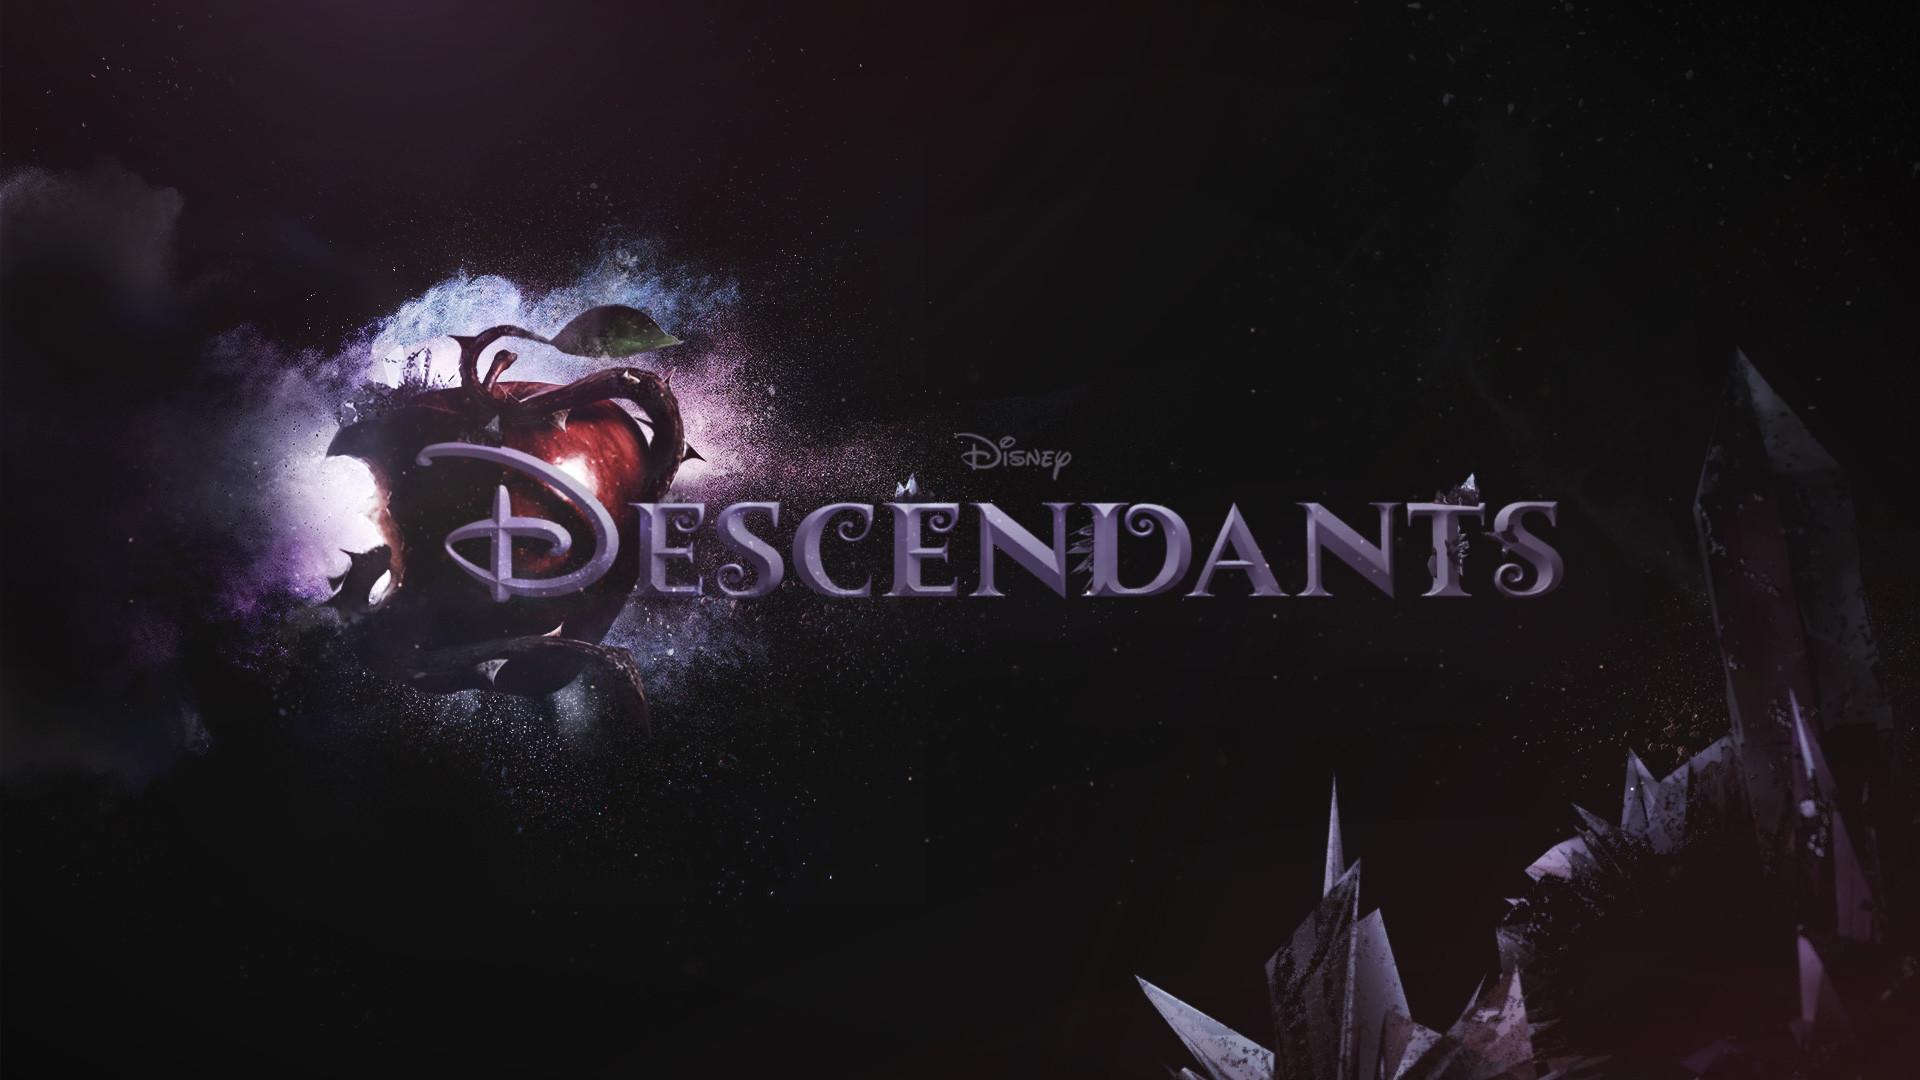 Descendants Disney Movie Wallpaper 70 Images